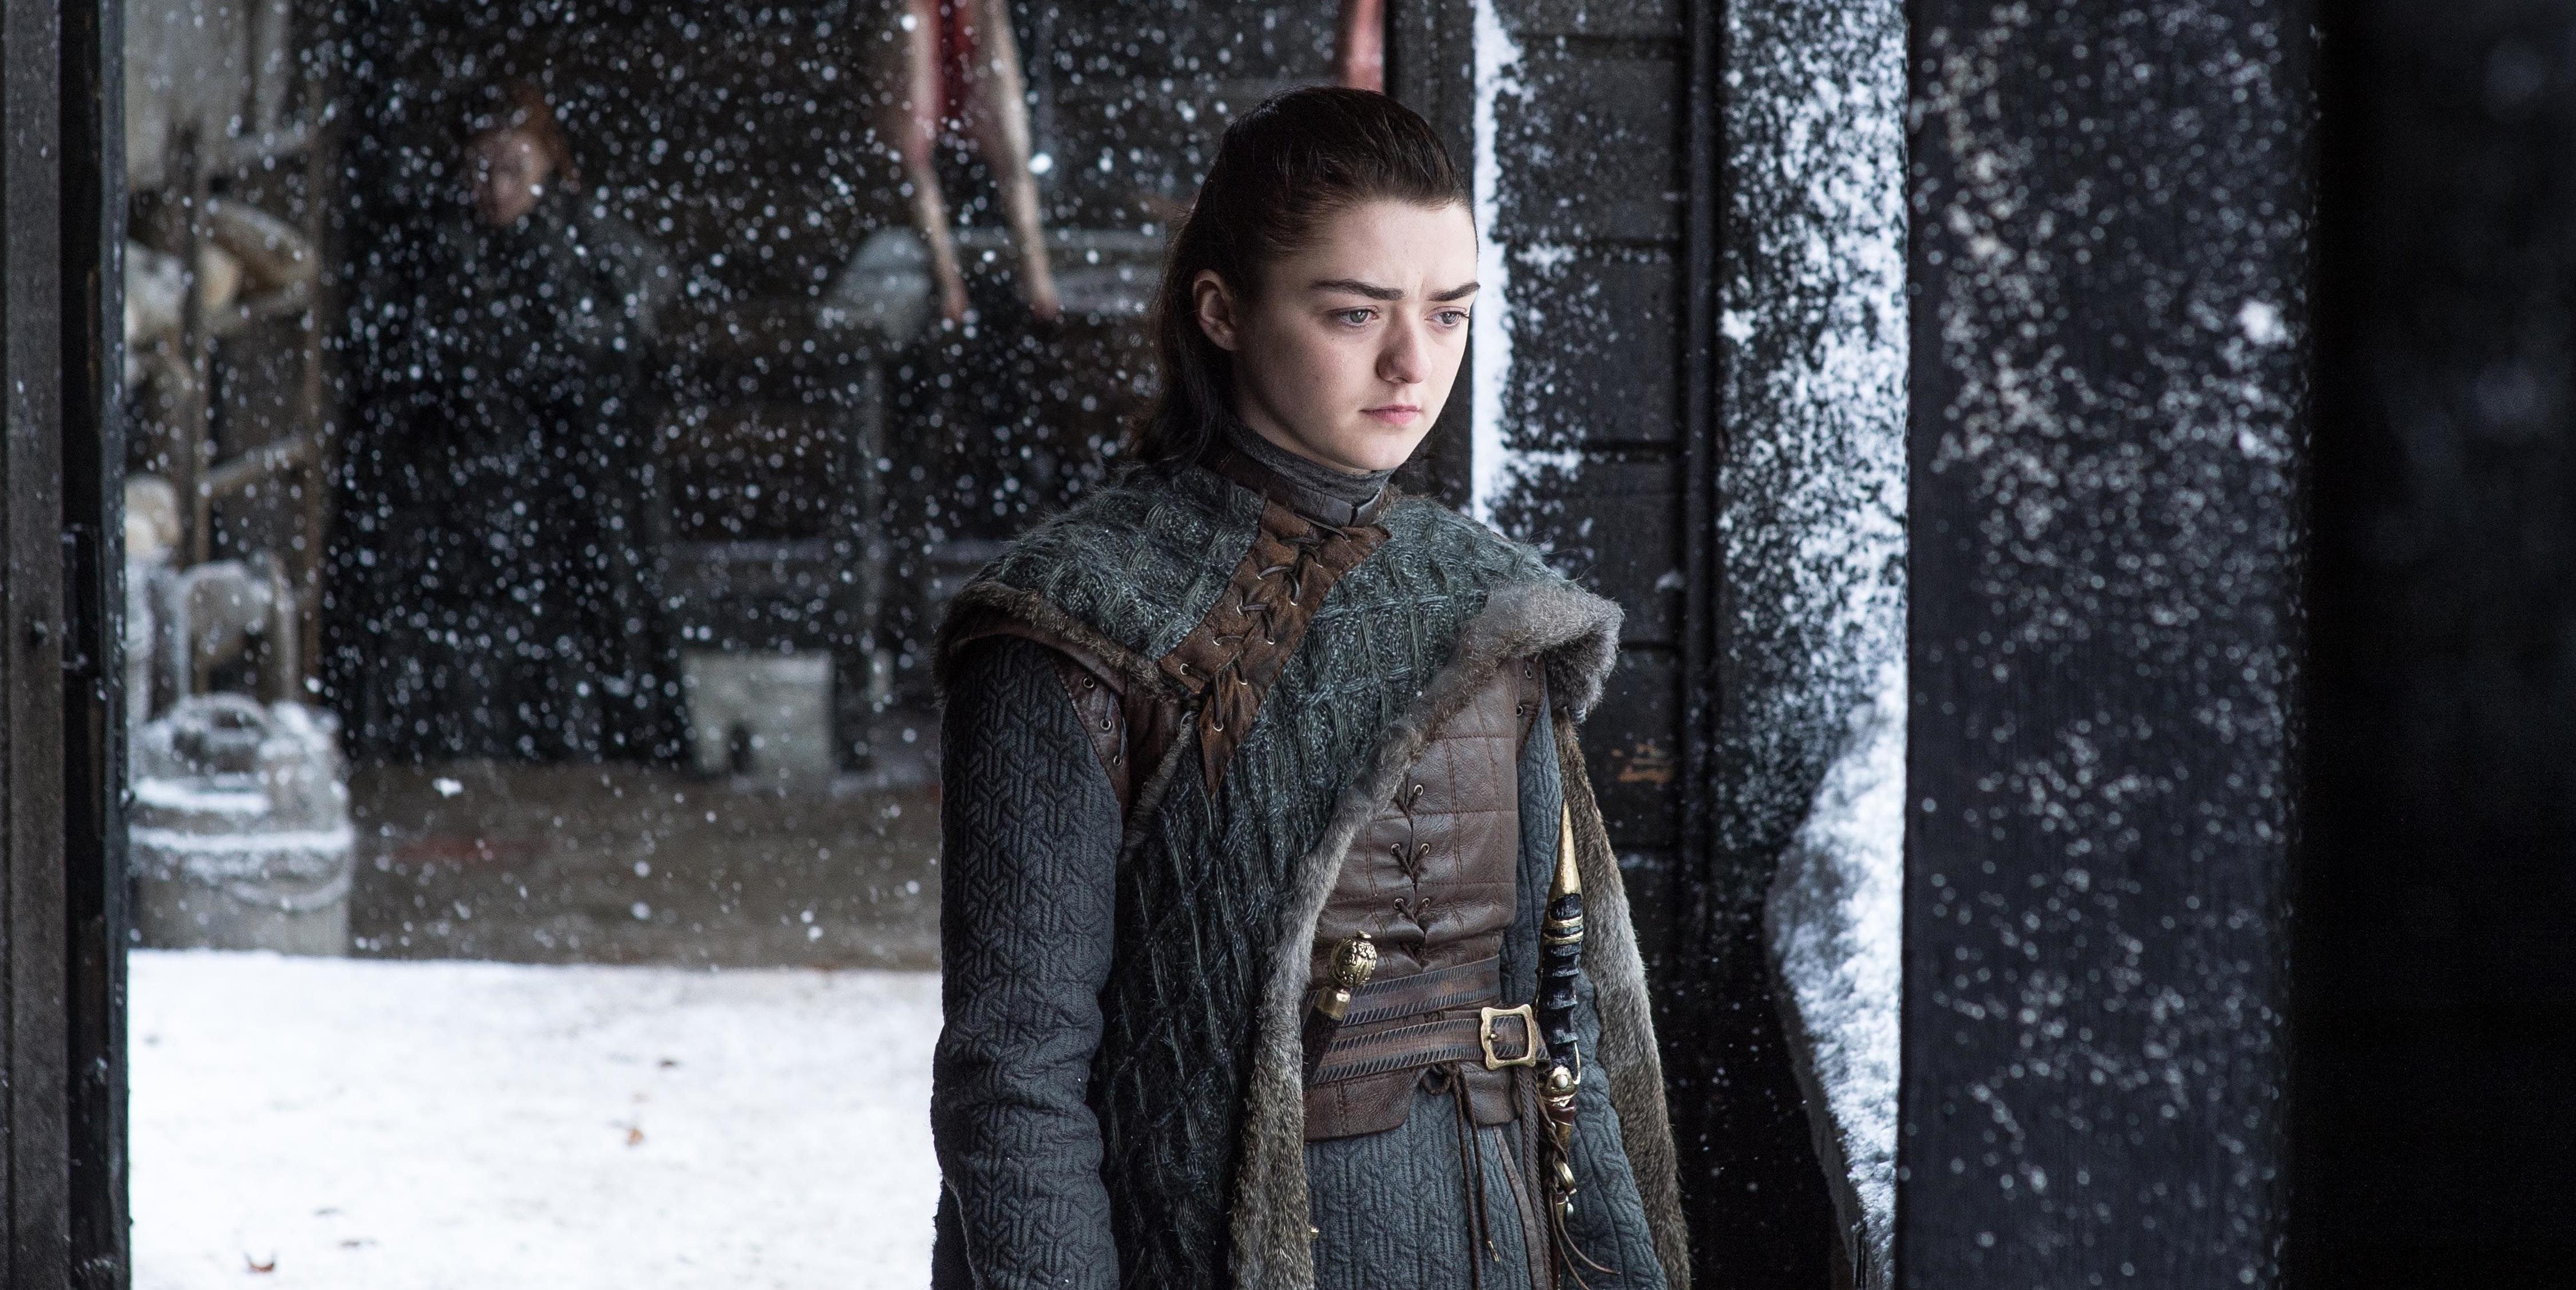 Game Of Thrones Season 8 Trailer Too Dark Reddit Made A Brighter